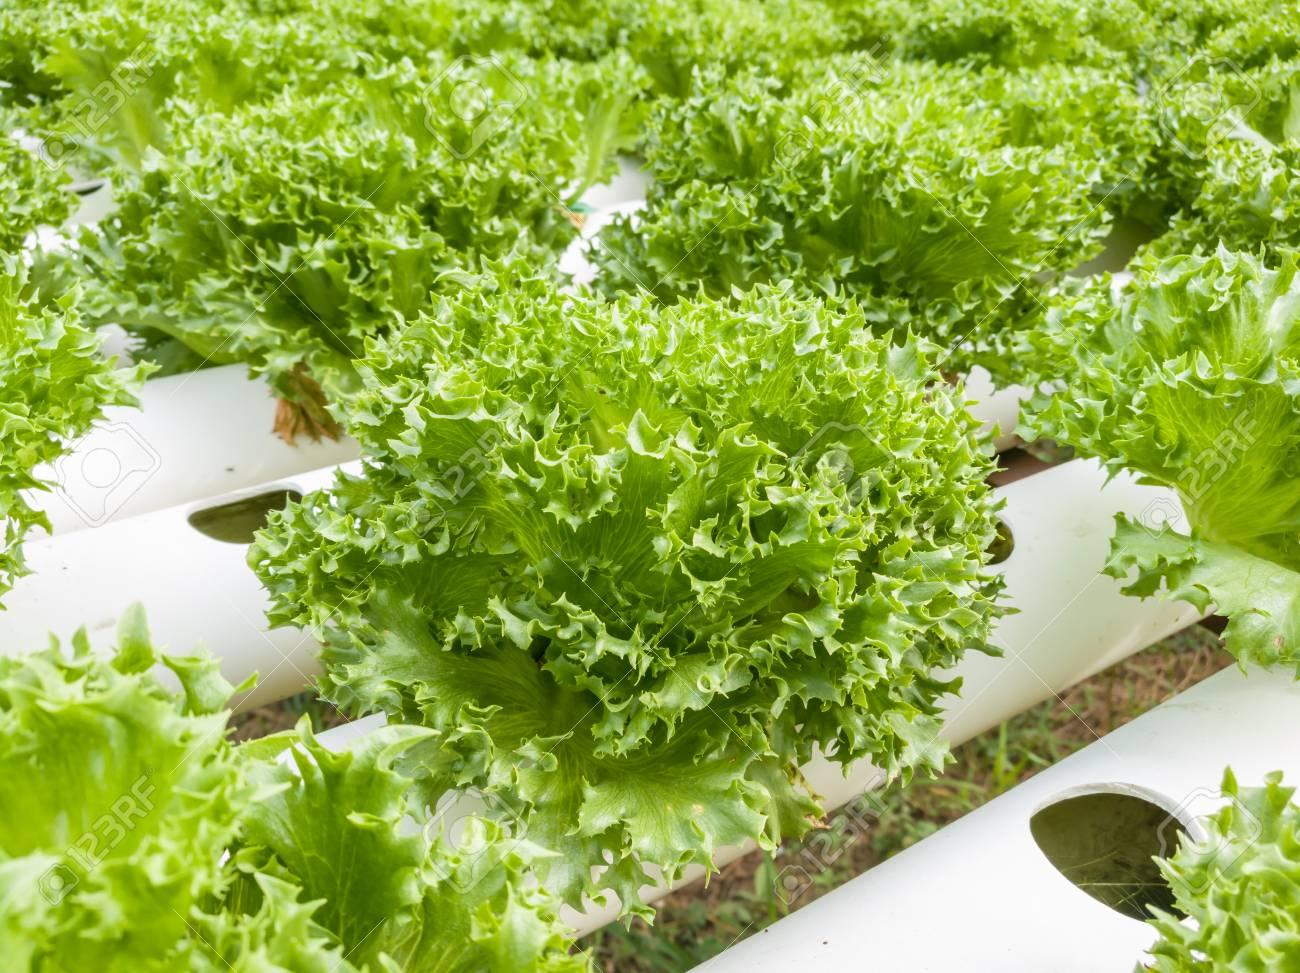 Salad vegetable green fresh lettuce in farm close up - 106236397